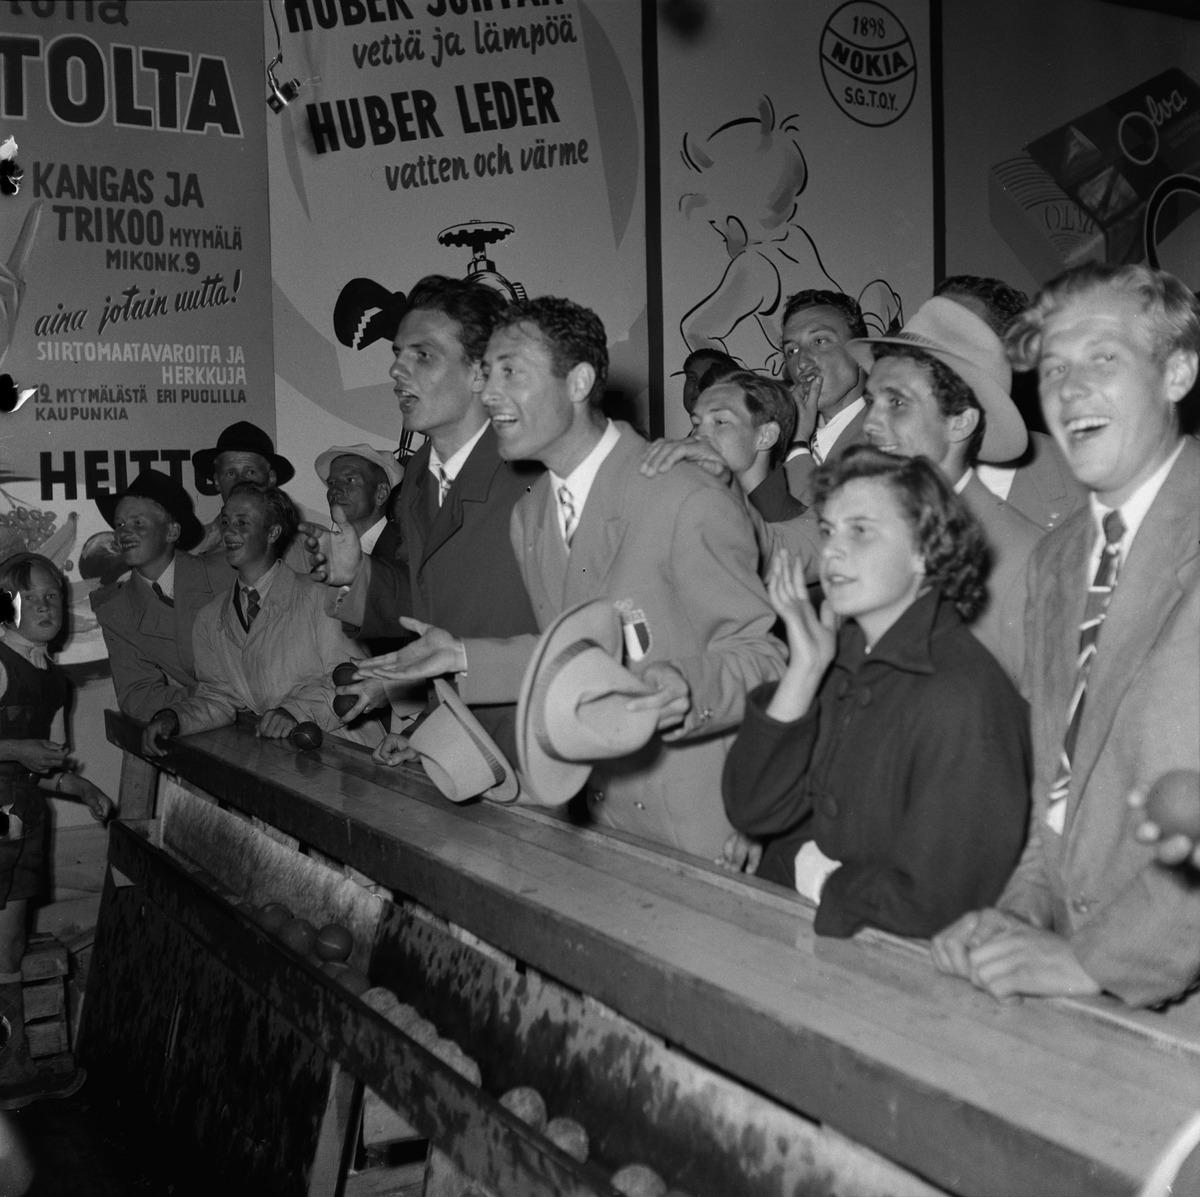 Helsingin olympialaiset 1952.